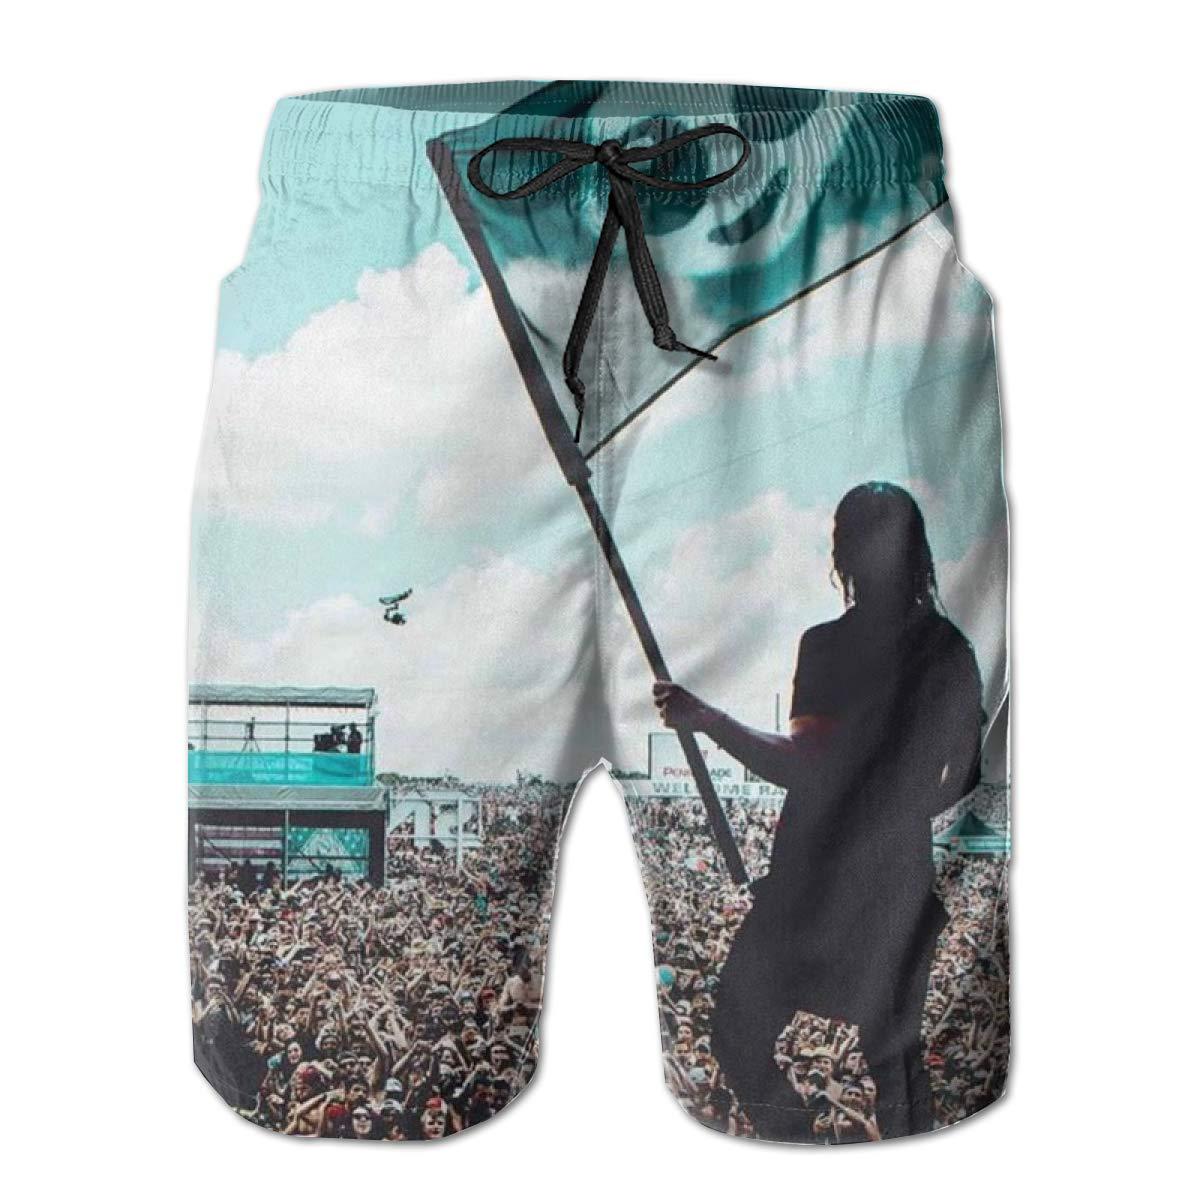 Nathalie R Salmeron Skrillex Mens Quick Dry Board Shorts Bathing Suit